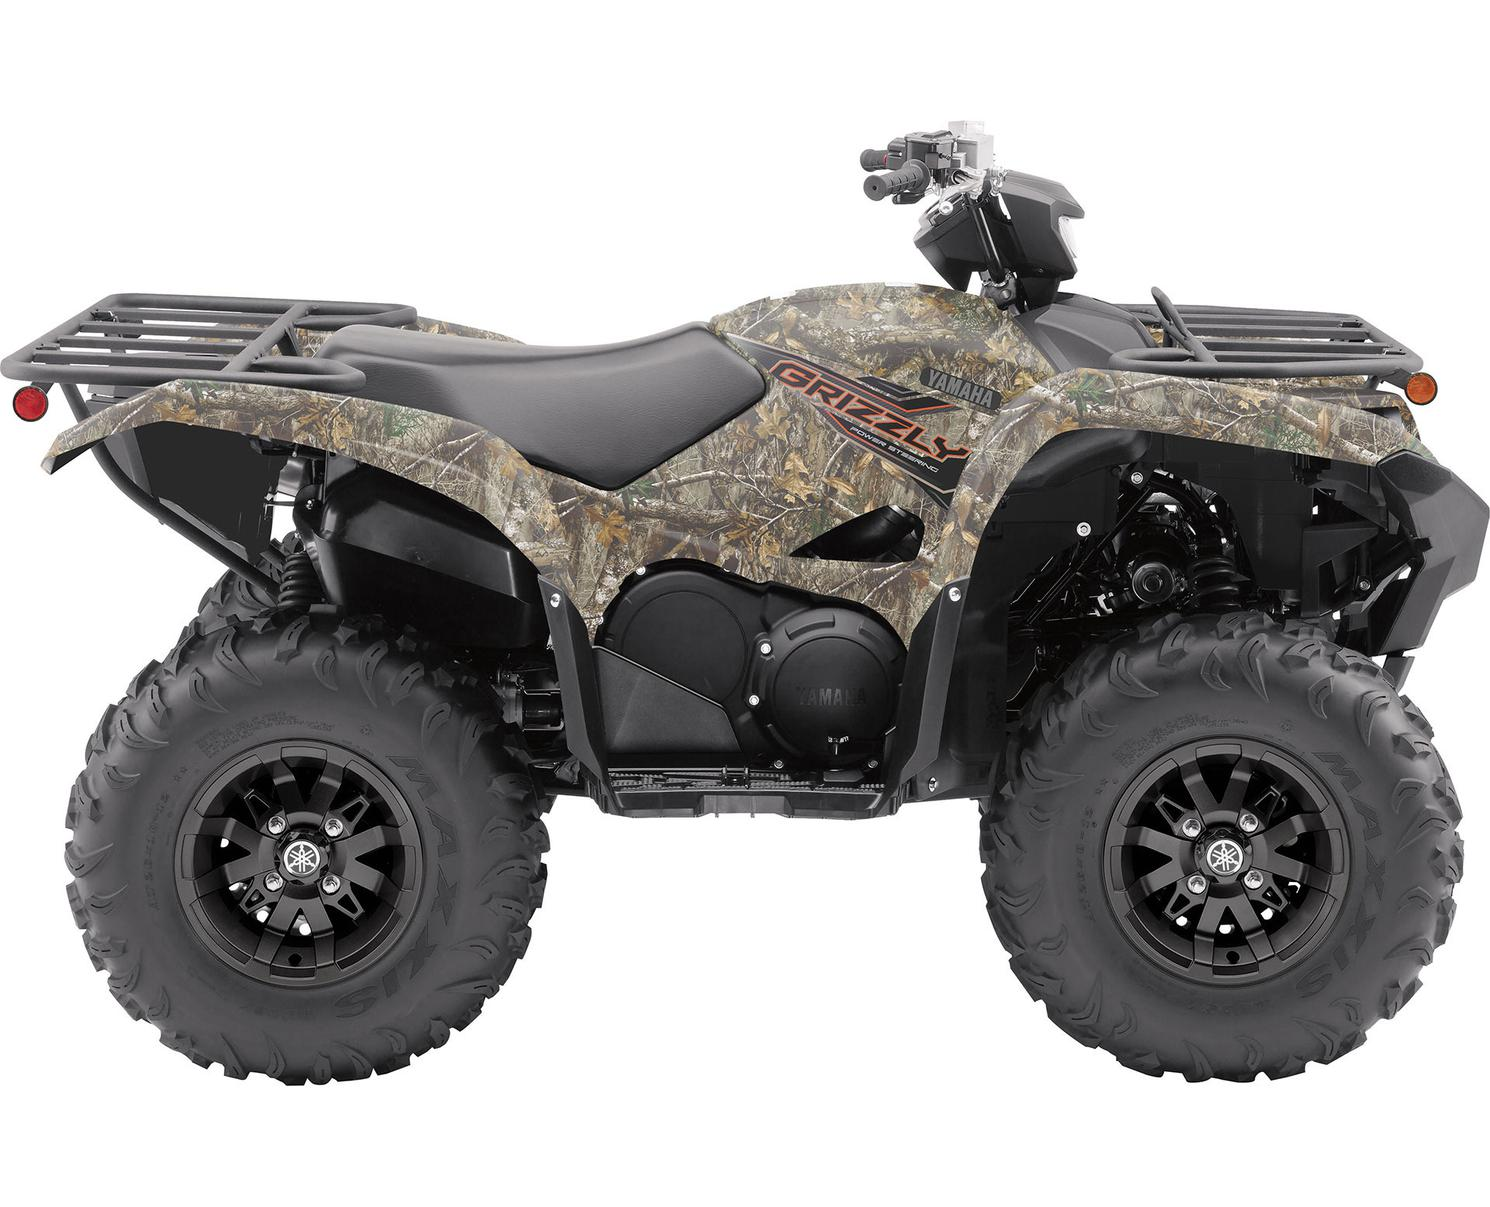 2021 Yamaha Grizzly 700 DAE